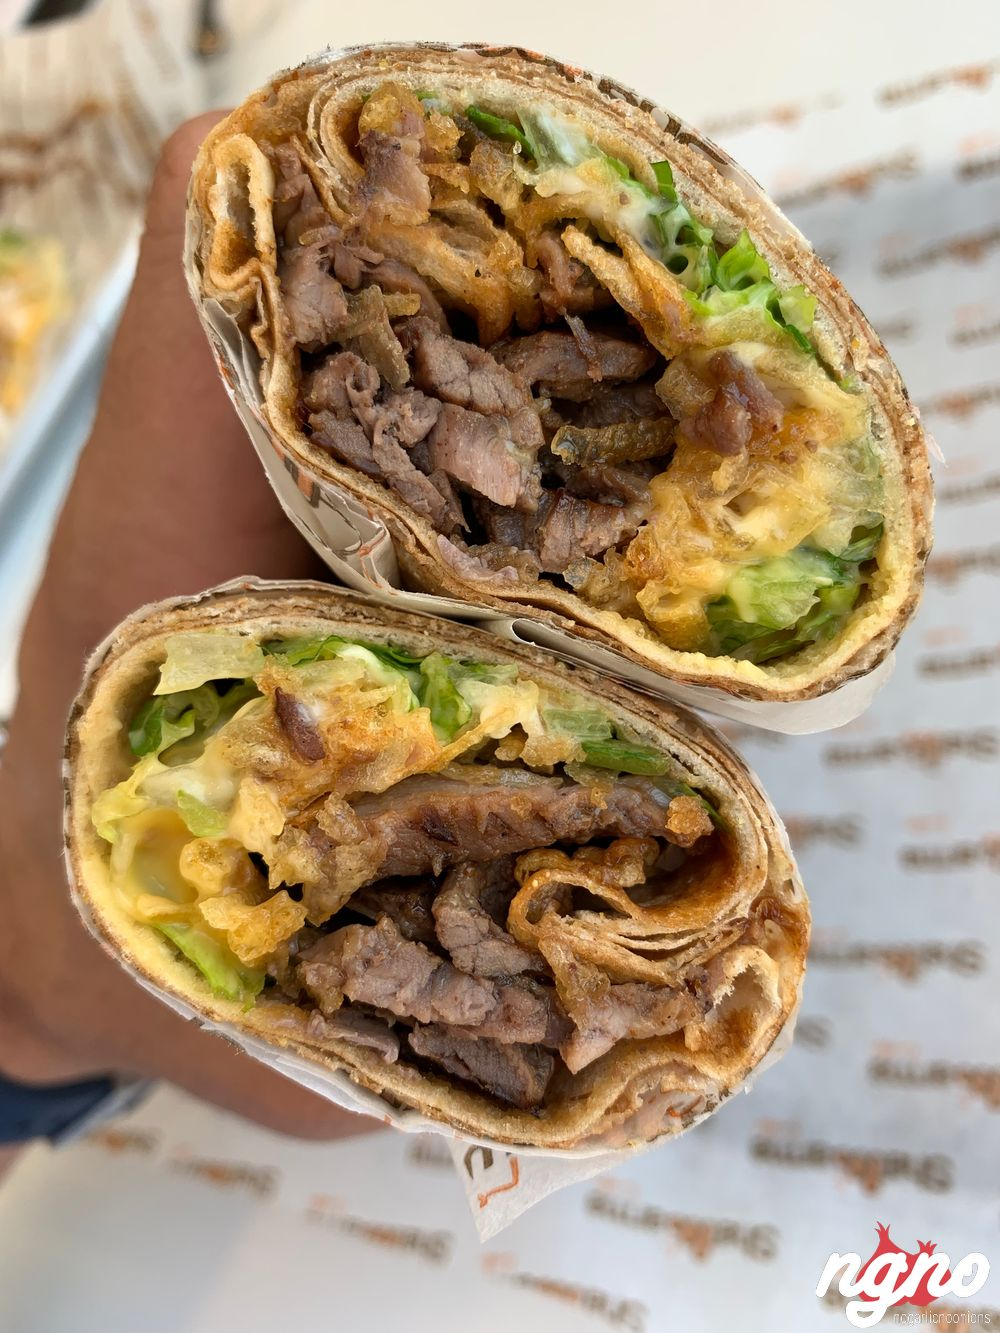 shawarma-lab-street-food-lebanon-nogarlicnoonions-322019-05-15-08-26-45